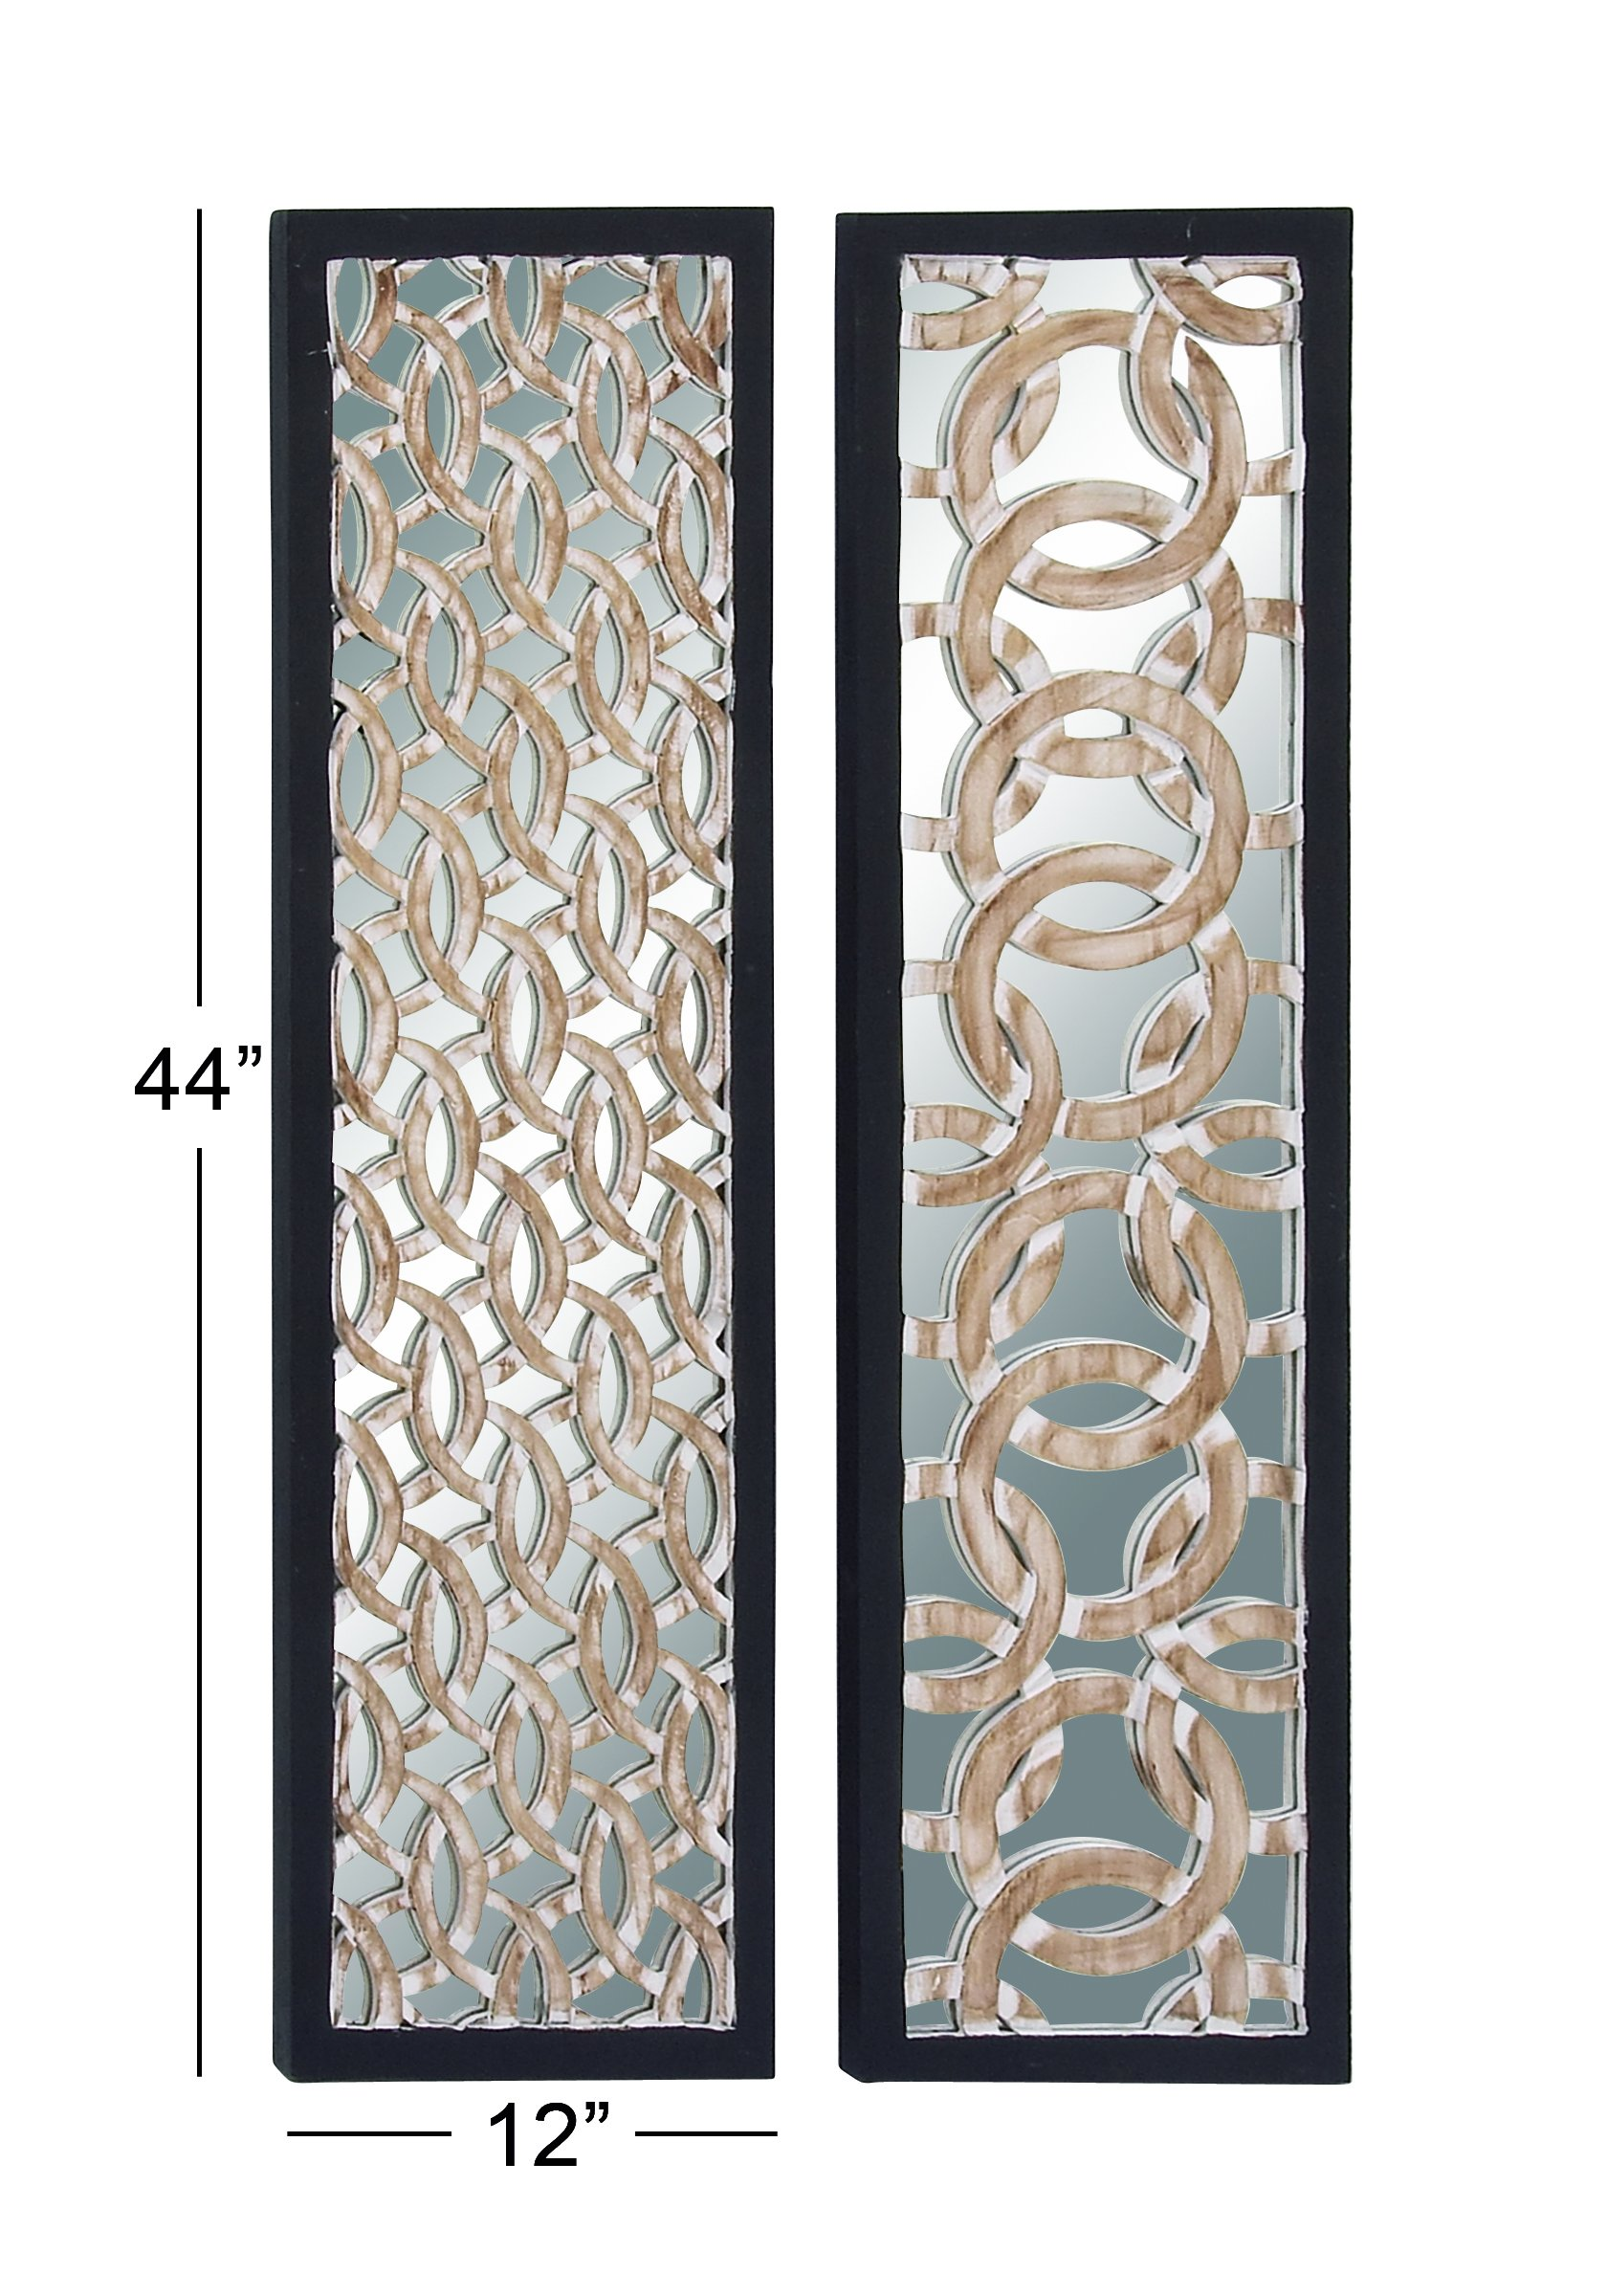 Deco 79 23768 Wood Mirror Wall Panel, 12'' x 44''